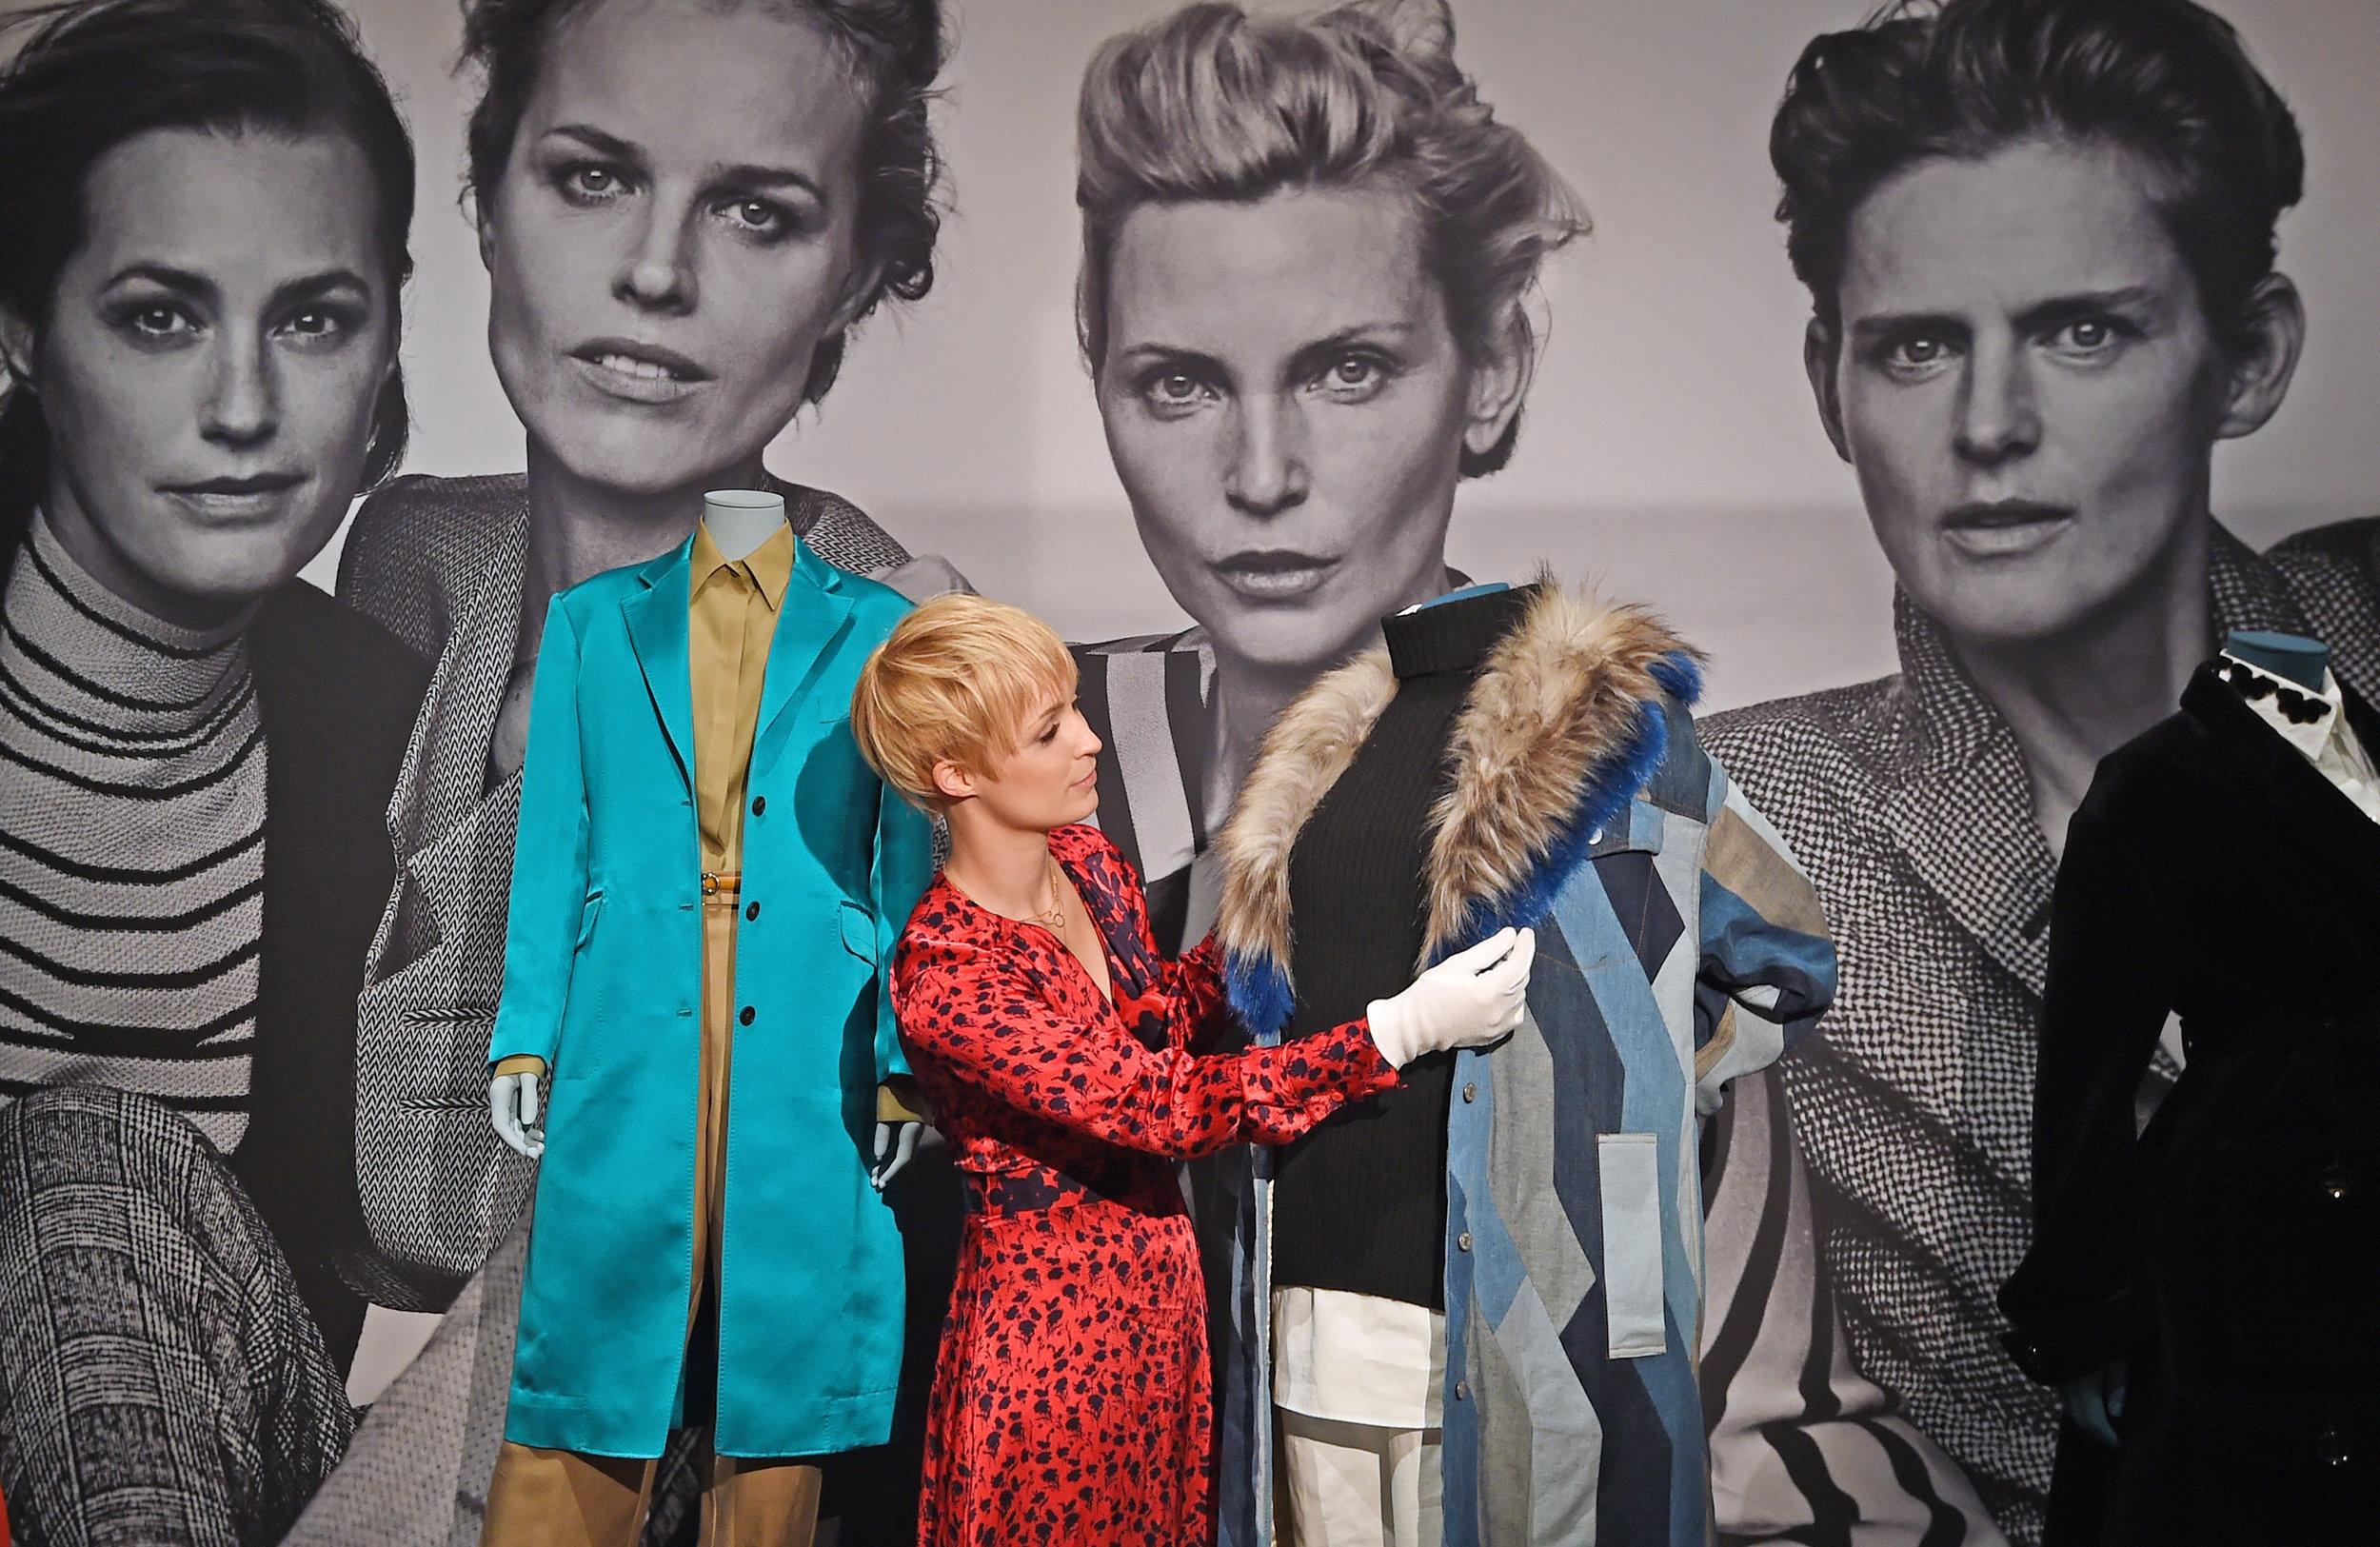 diversity in fashion exhibition